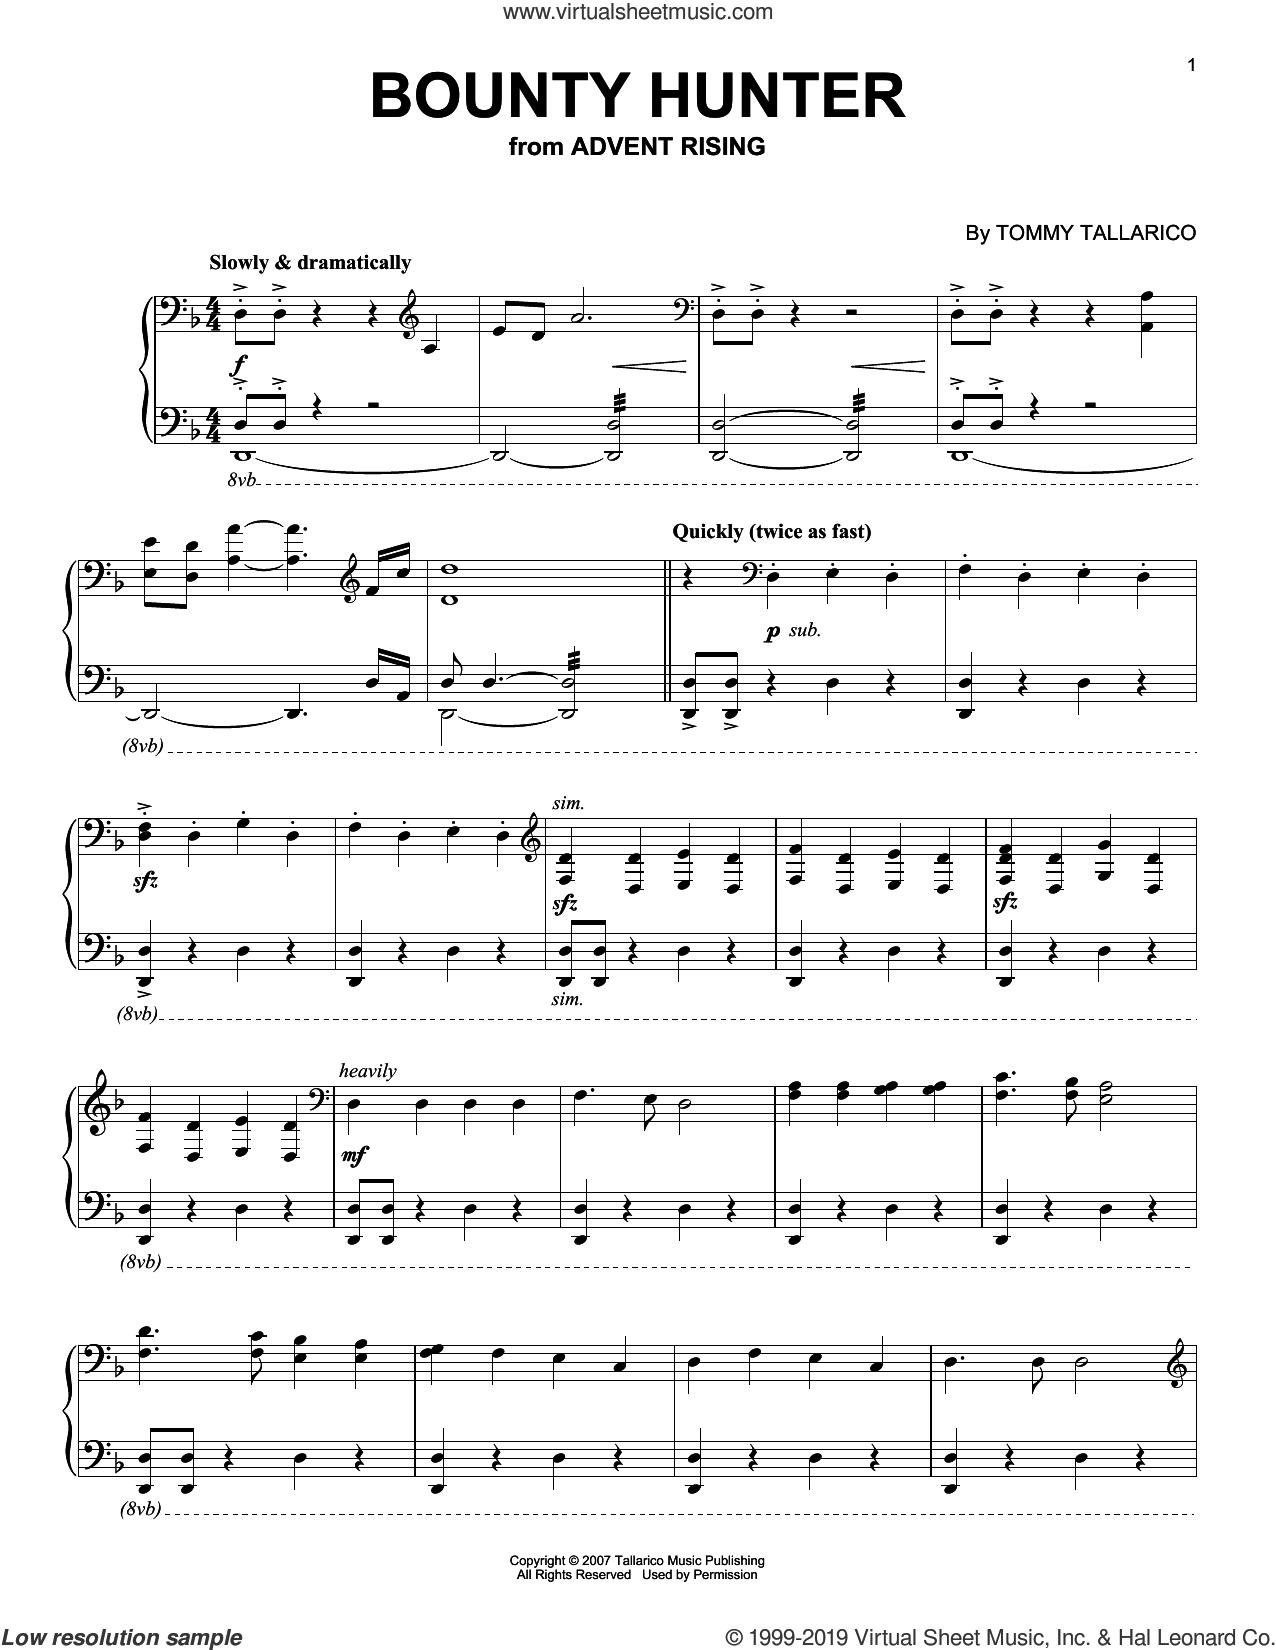 Bounty Hunter sheet music for piano solo by Tommy Tallarico, intermediate skill level